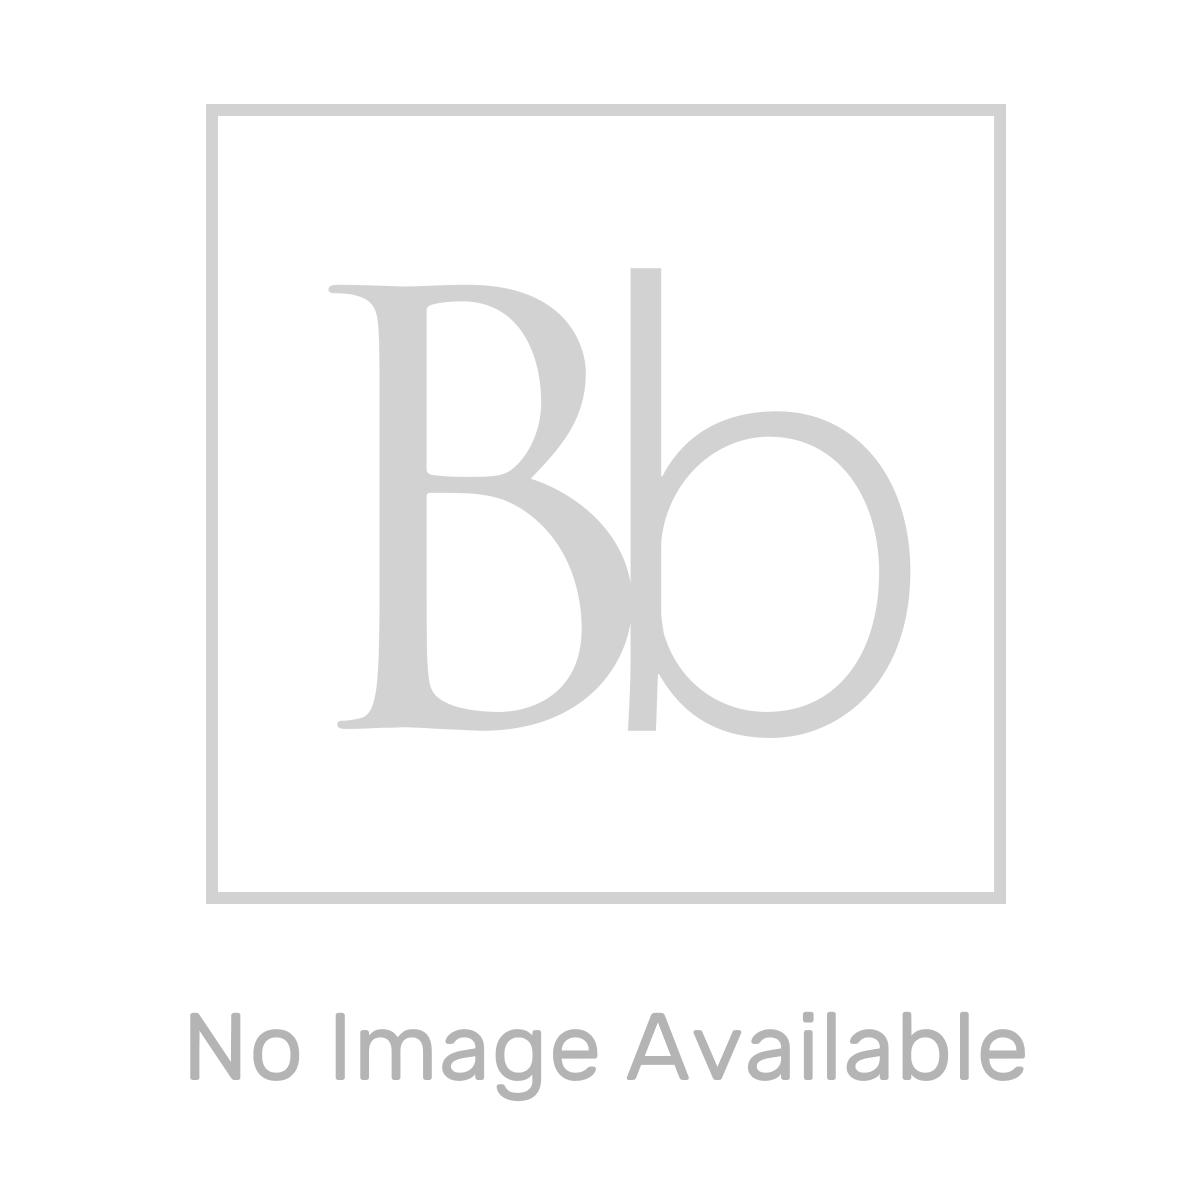 Prestige2 Frameless Hinged Shower Door with Optional Side Panel Detail 2